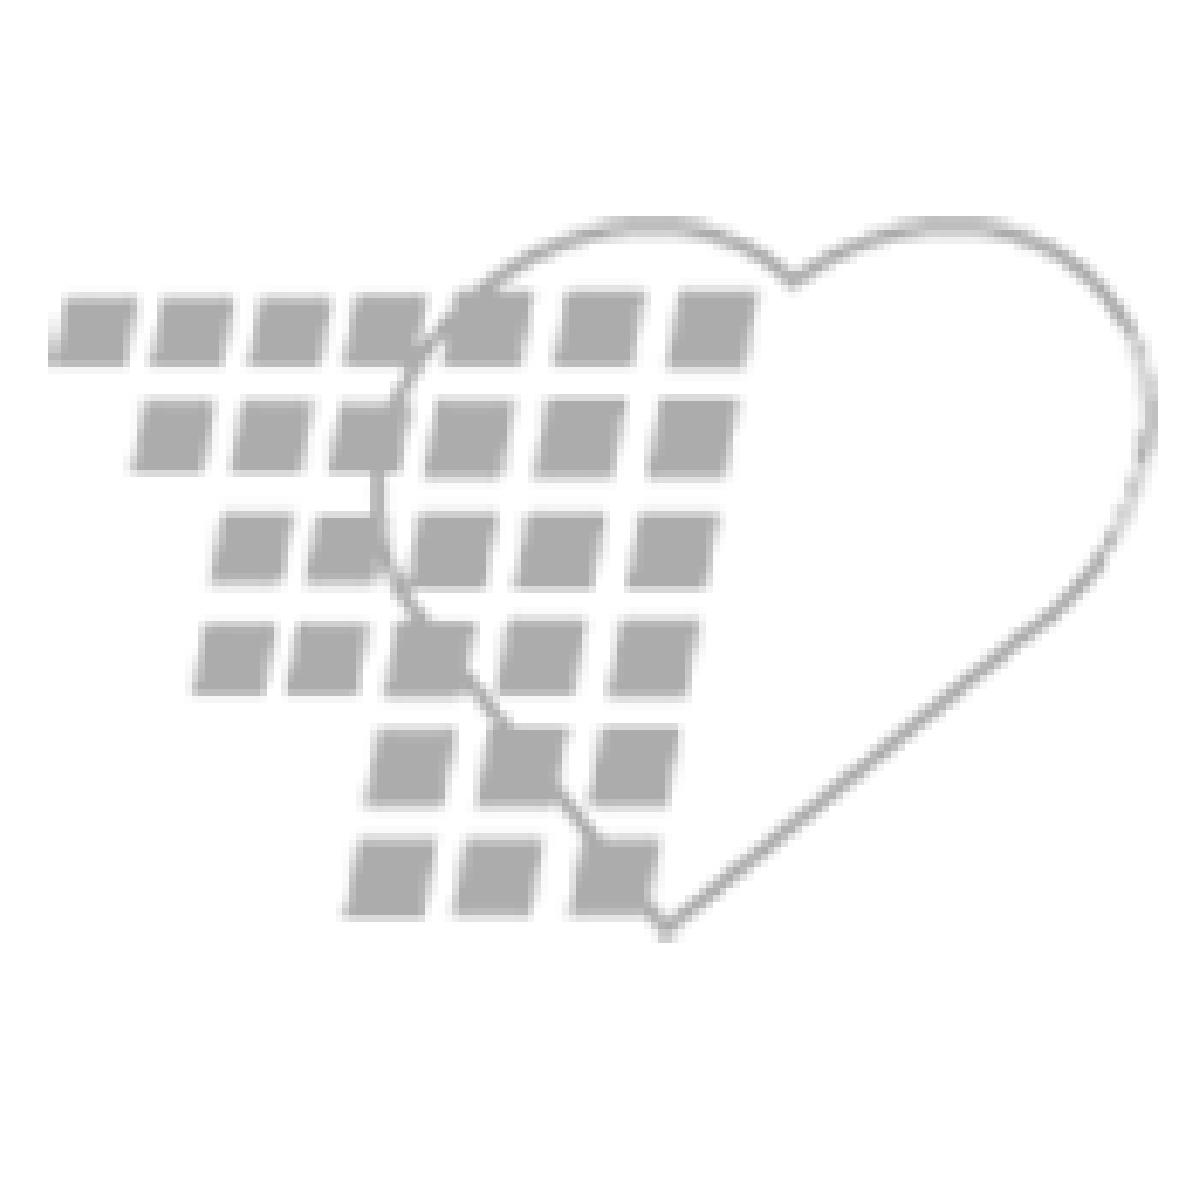 02-92-1108 Skyndex® Skinfold Caliper Durnin/Slaughter-Lohman - 14 x 5 x 10 Inch